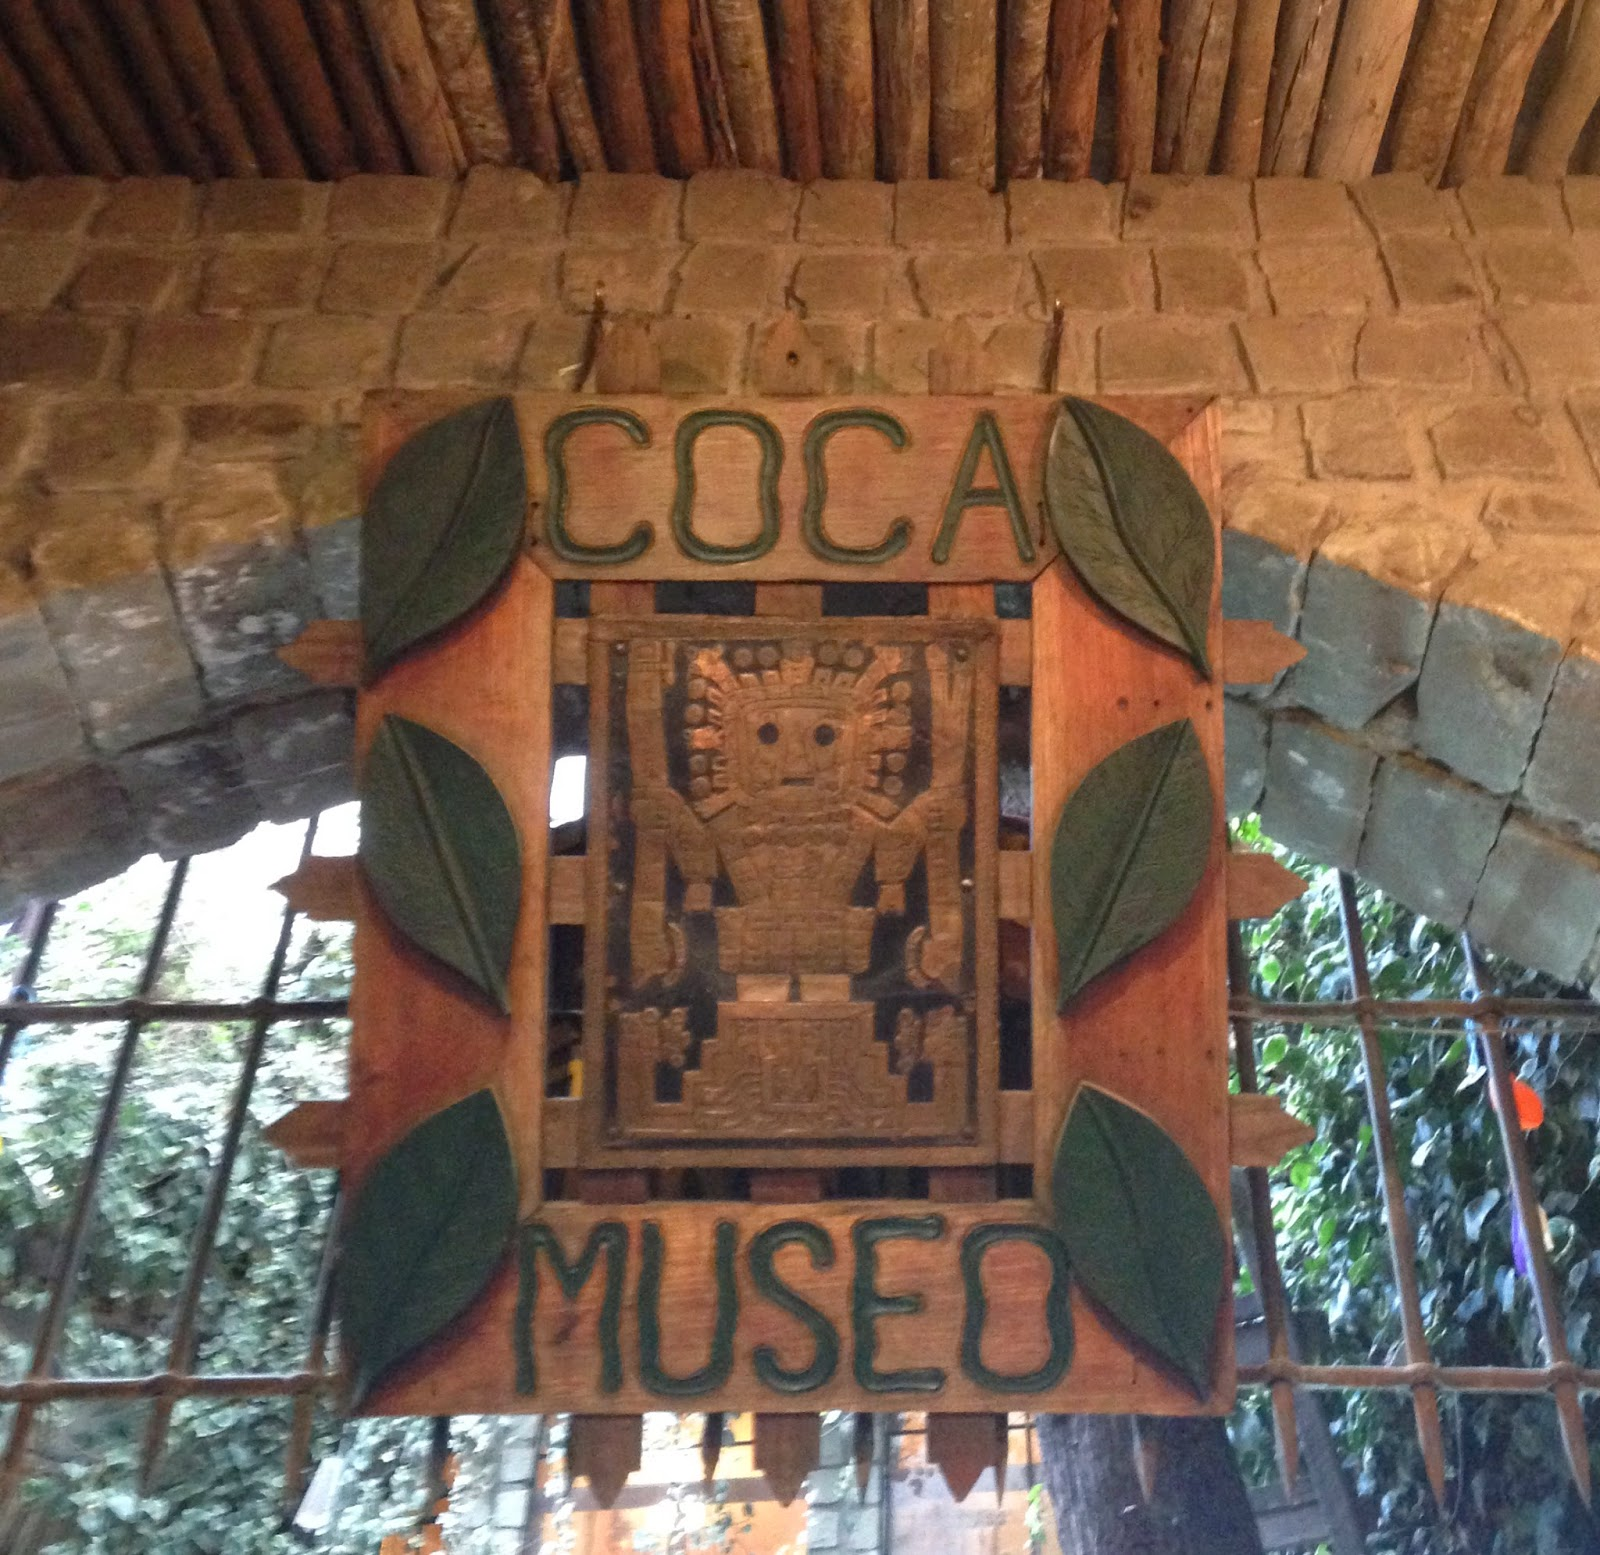 la paz coca museo bolivia